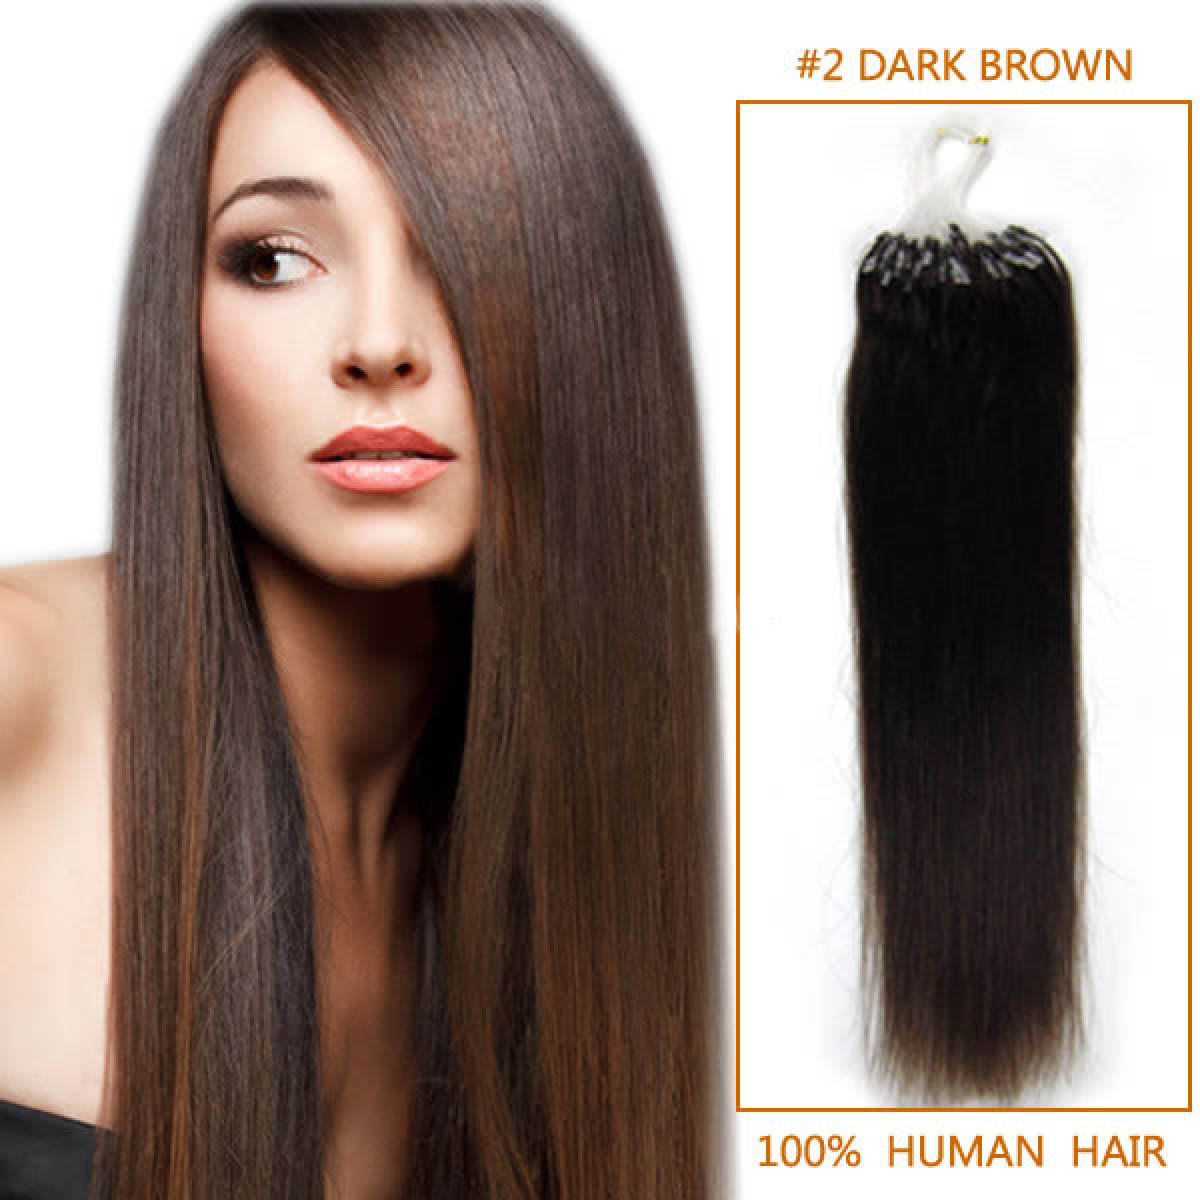 Inch 2 dark brown micro loop human hair extensions 100s 18 inch 2 dark brown micro loop human hair extensions 100s solutioingenieria Images